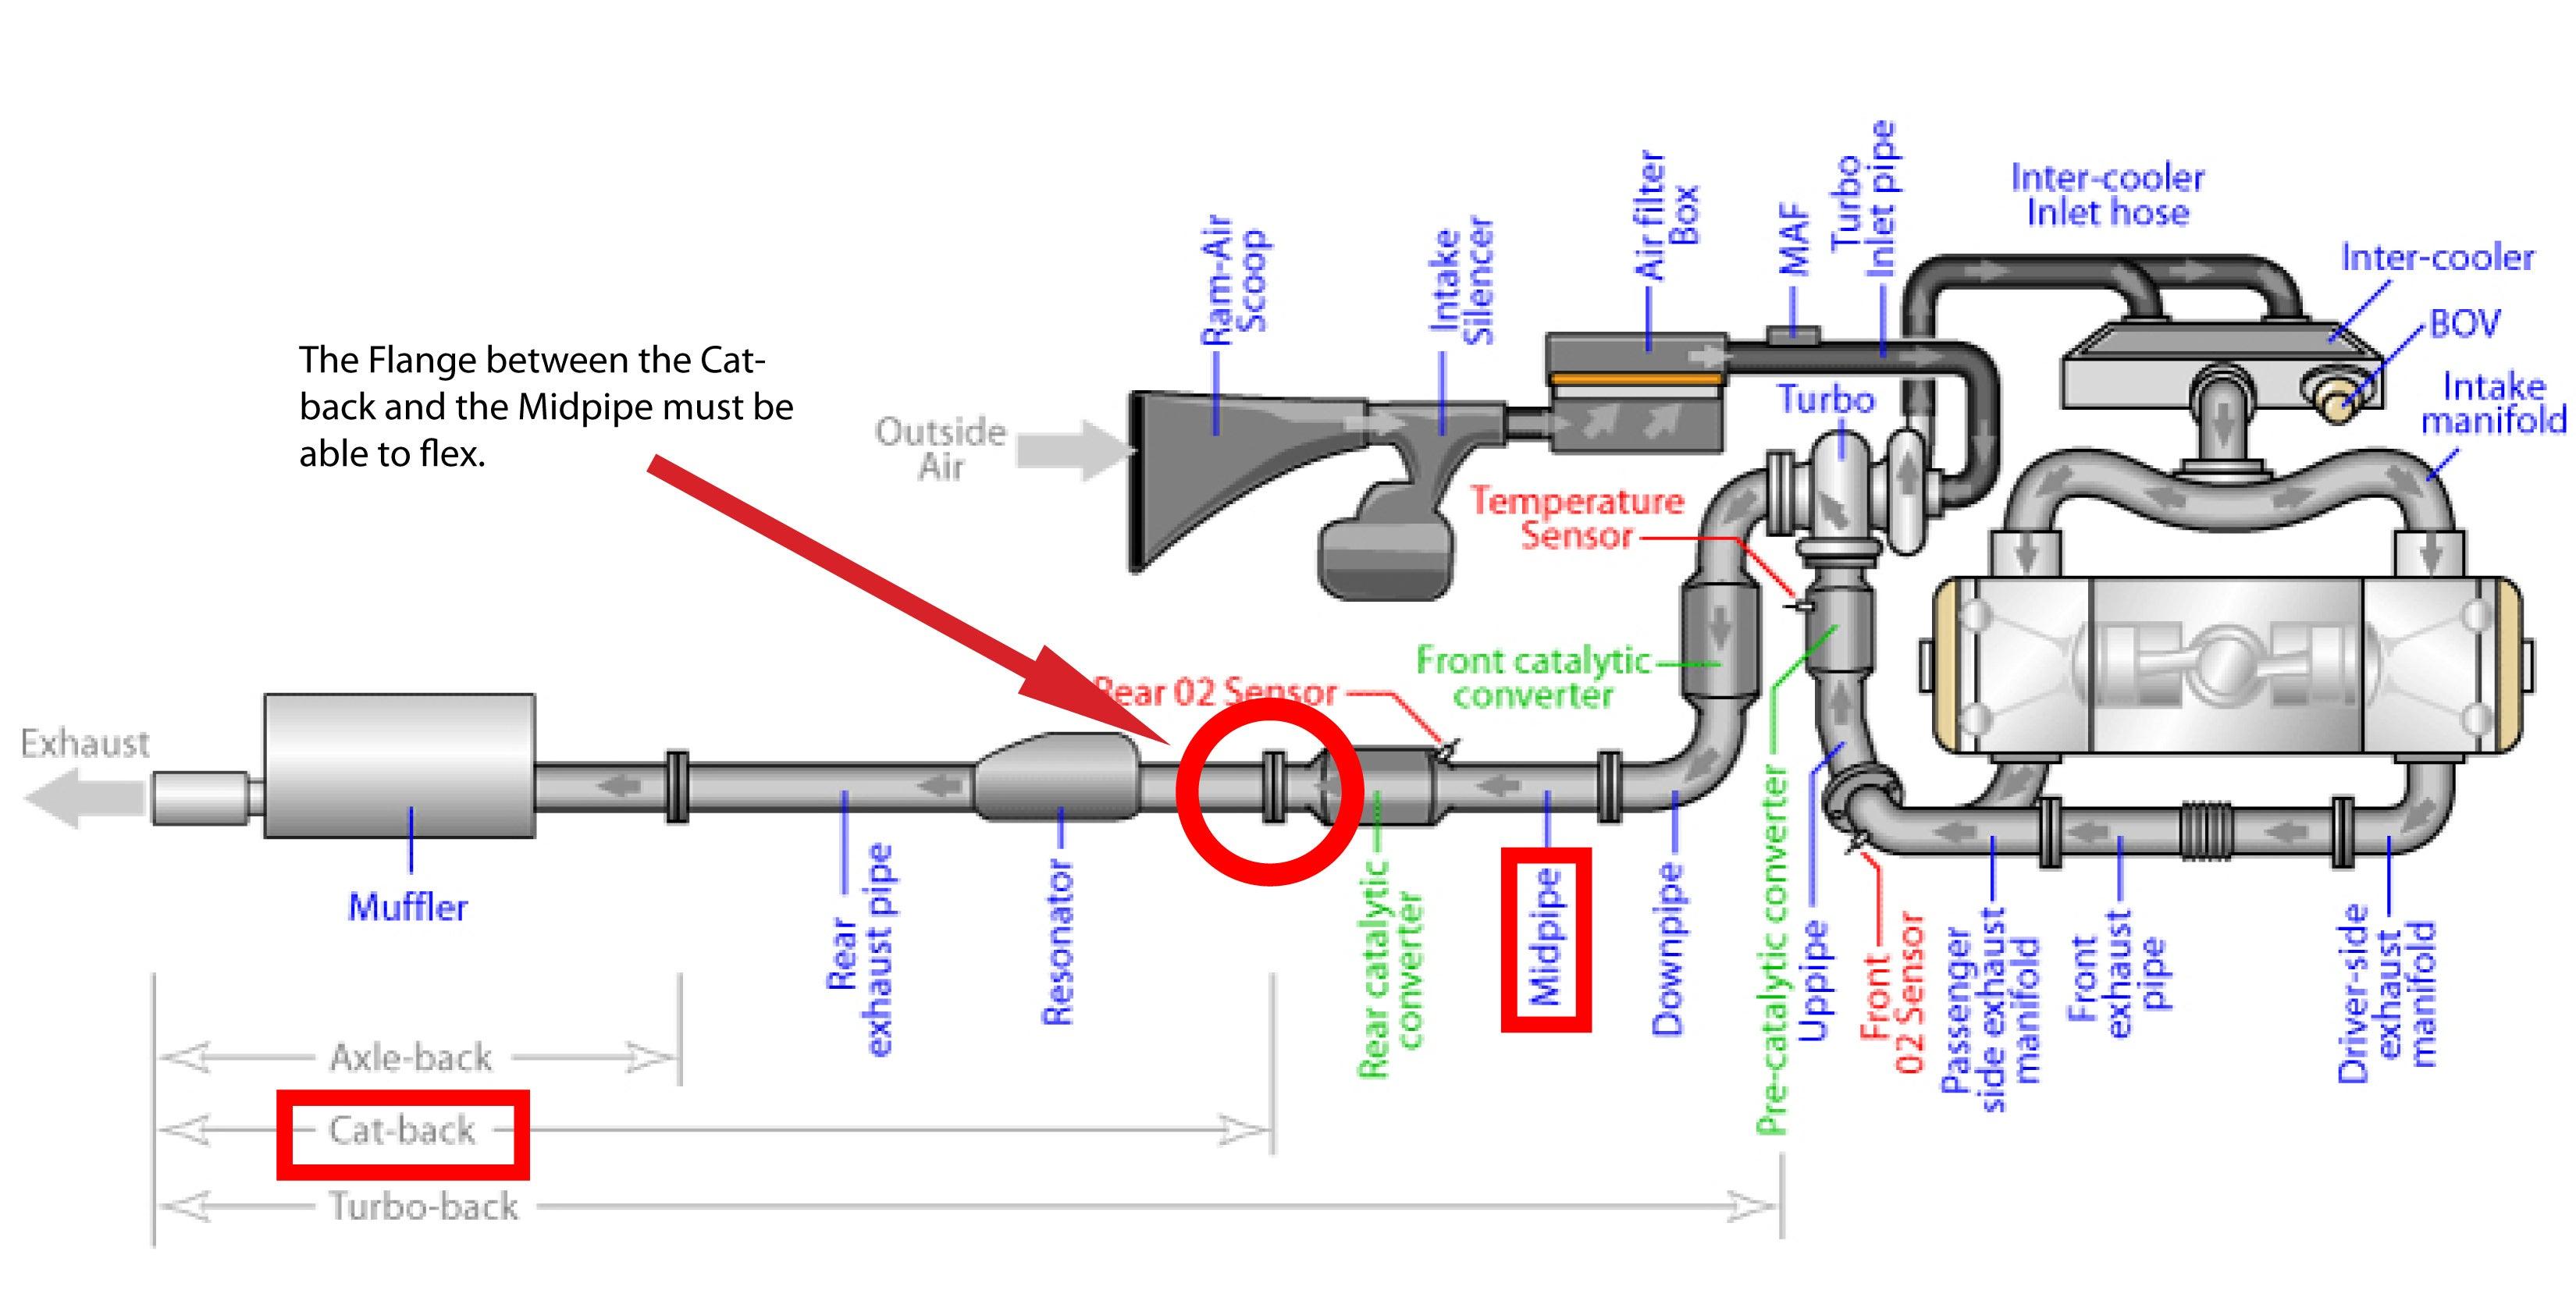 Subaru Exhaust Leak Repair   4 Steps